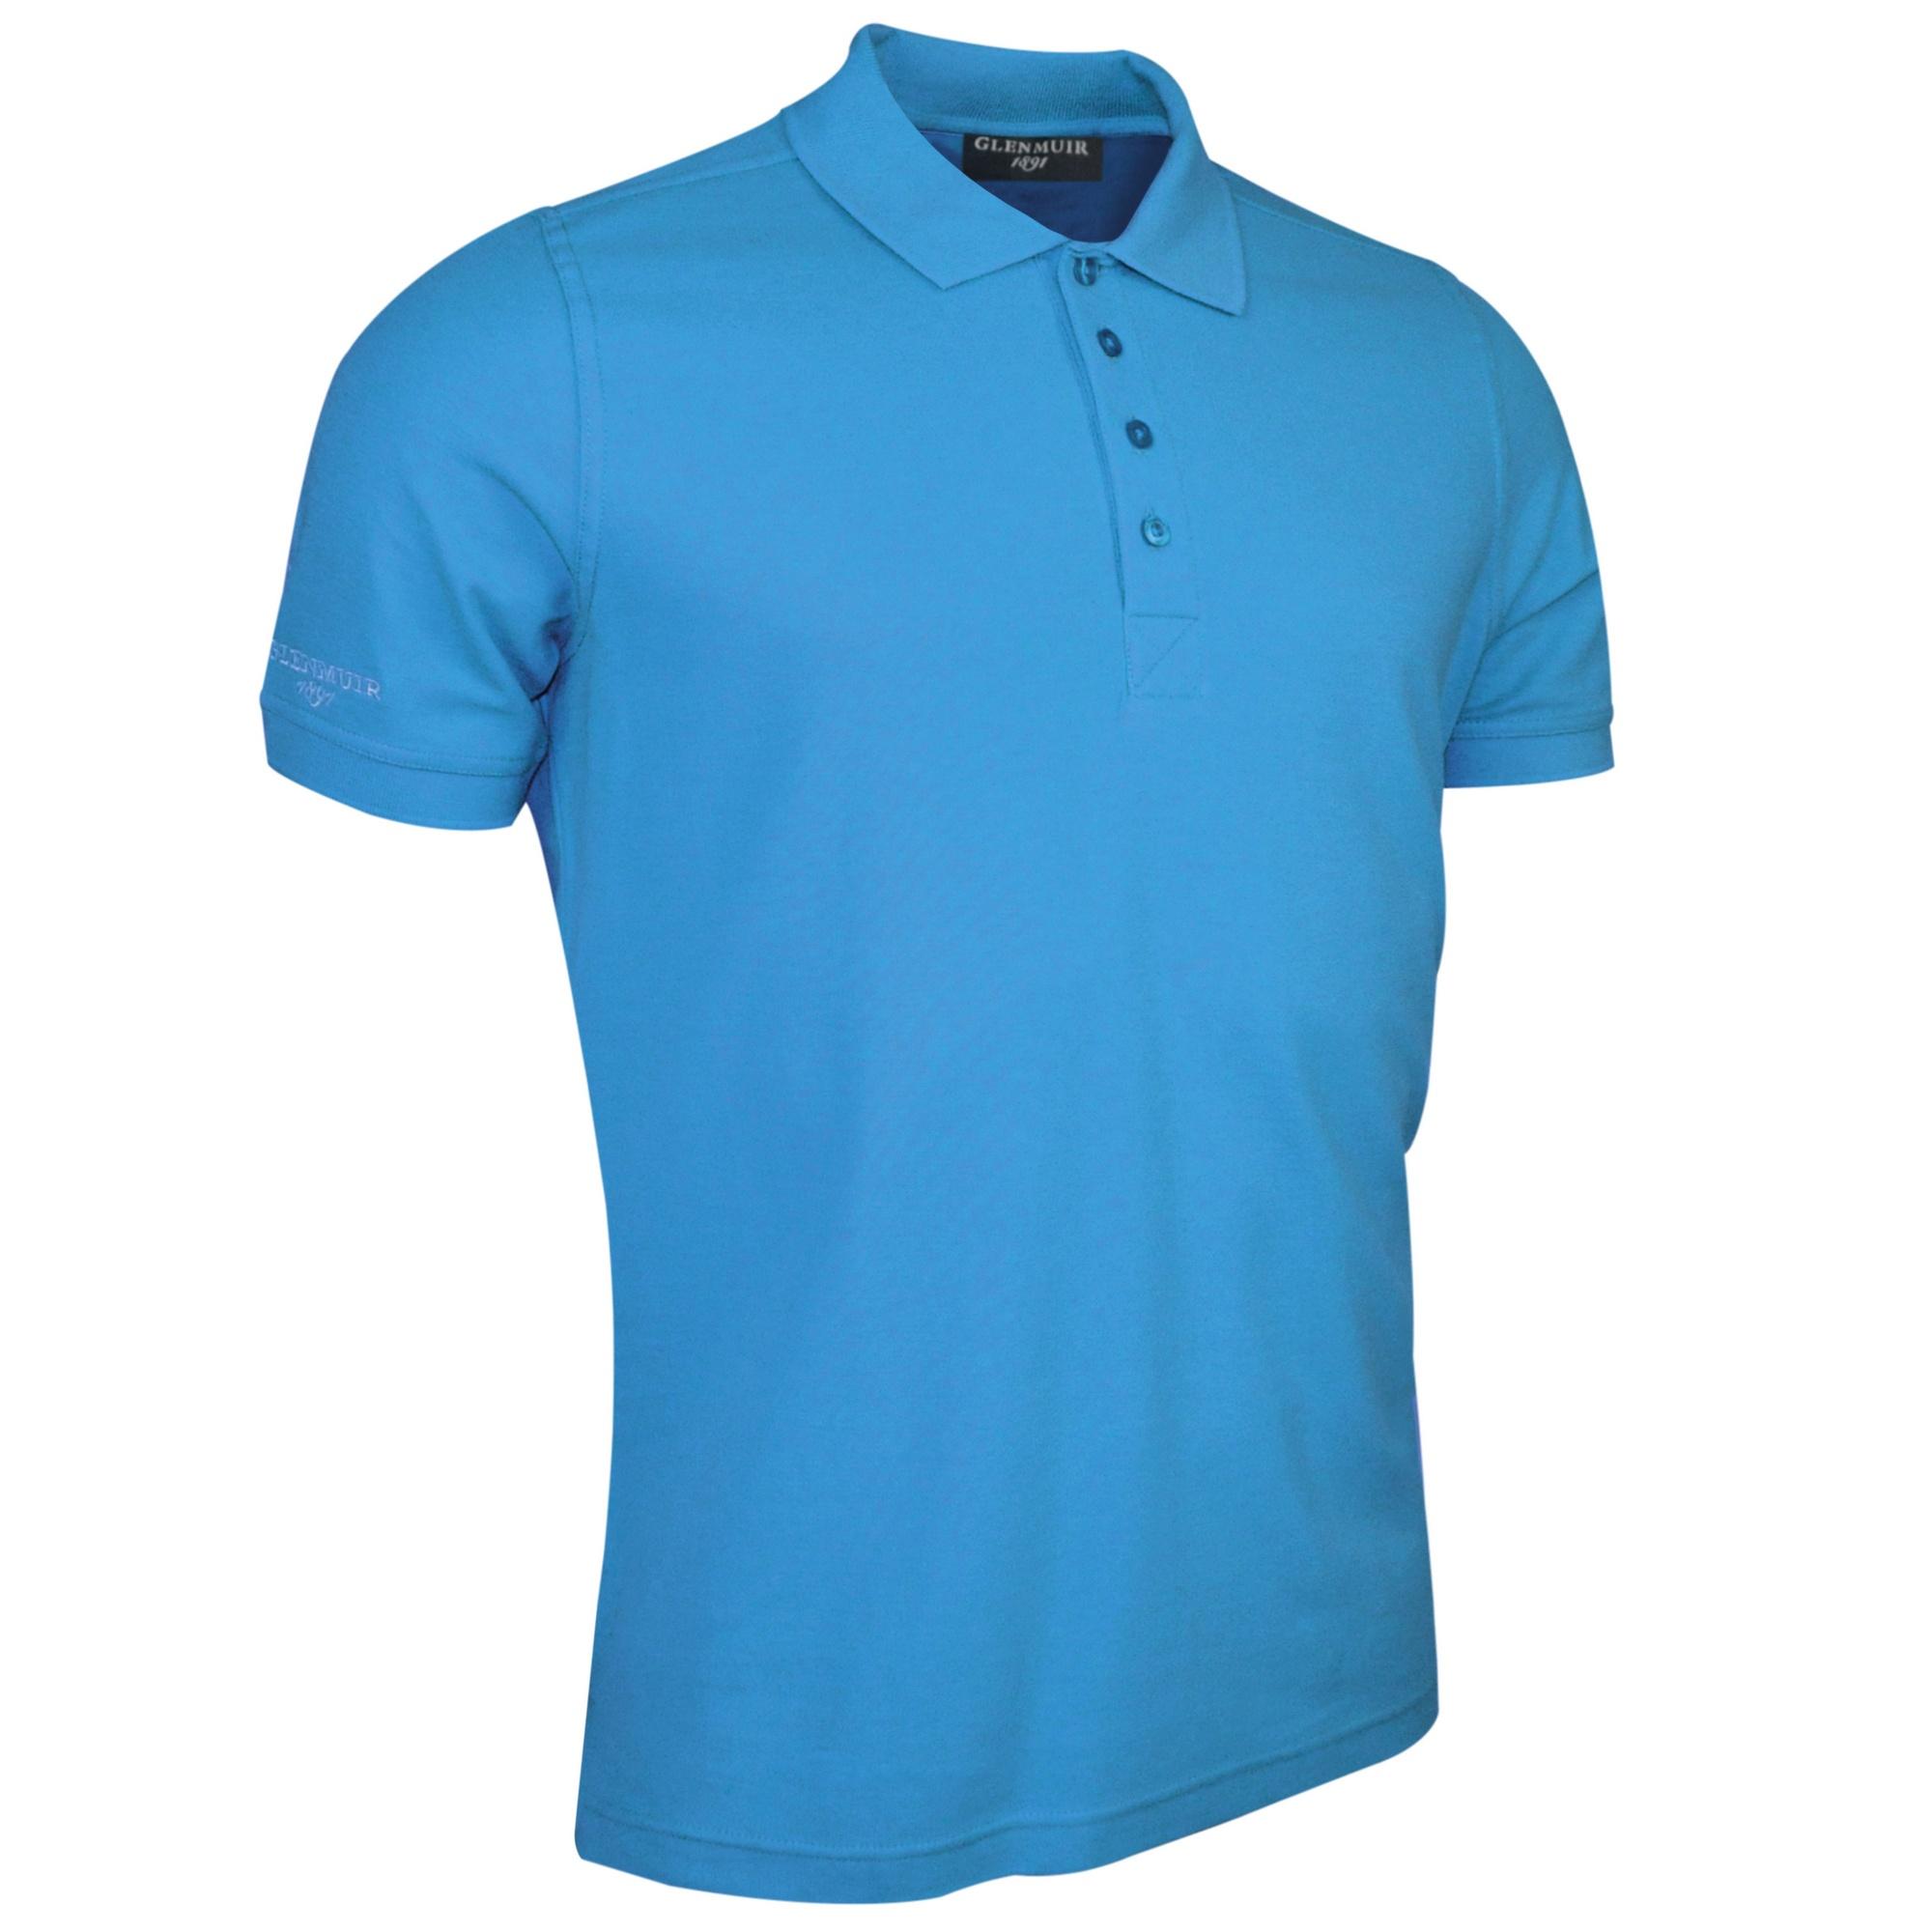 Glenmuir Kinlock - Mens Pique Polo Shirt (L) (Light Blue)